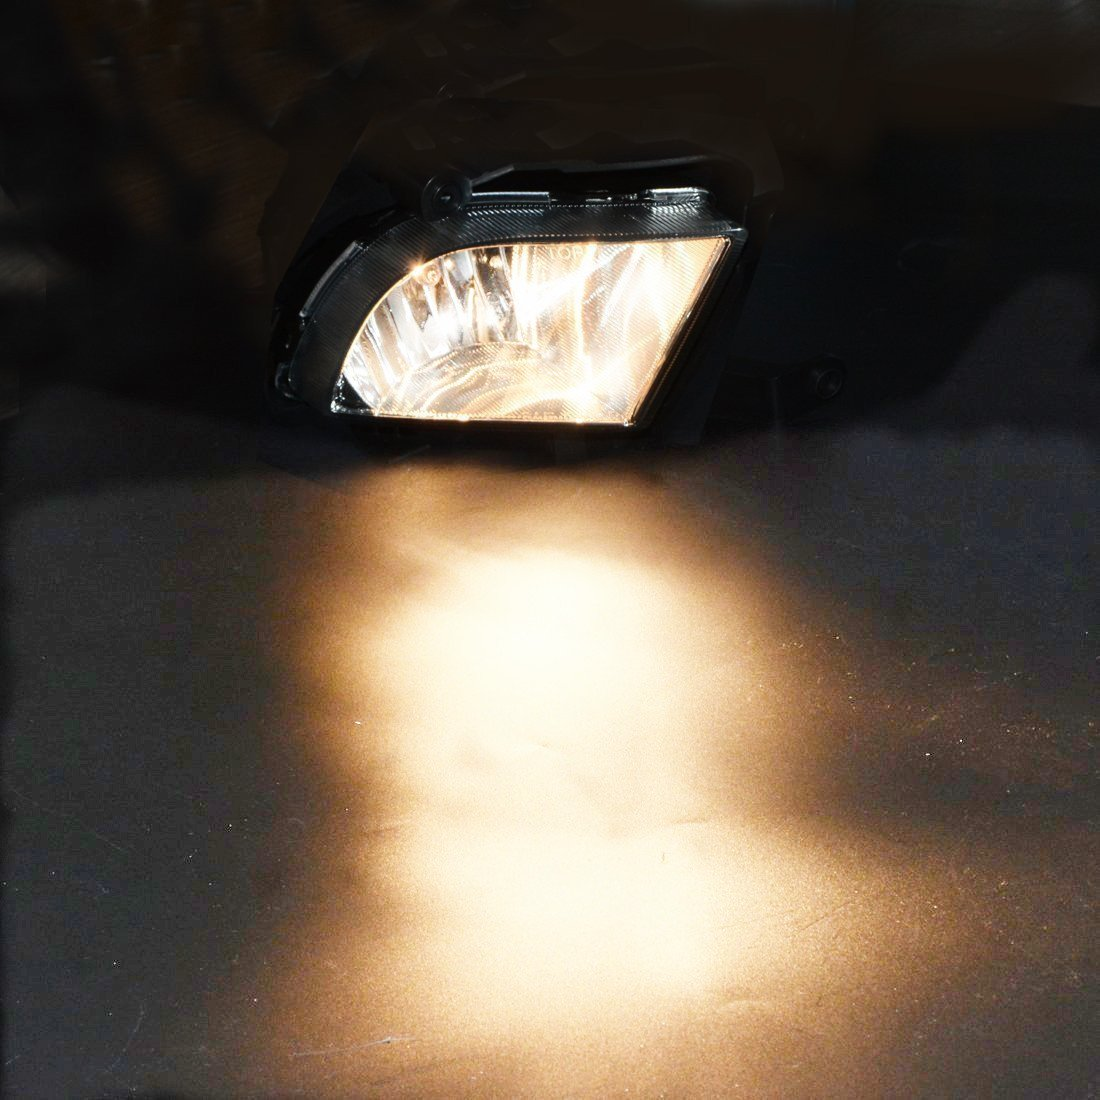 Autosaver88 Fog Lights For Kia Forte Sedan 4 Door 2010 Fuse Box 2011 2012 Oe Style 881 Halogen 12v 27w Bulbs Wiring Harness Automotive